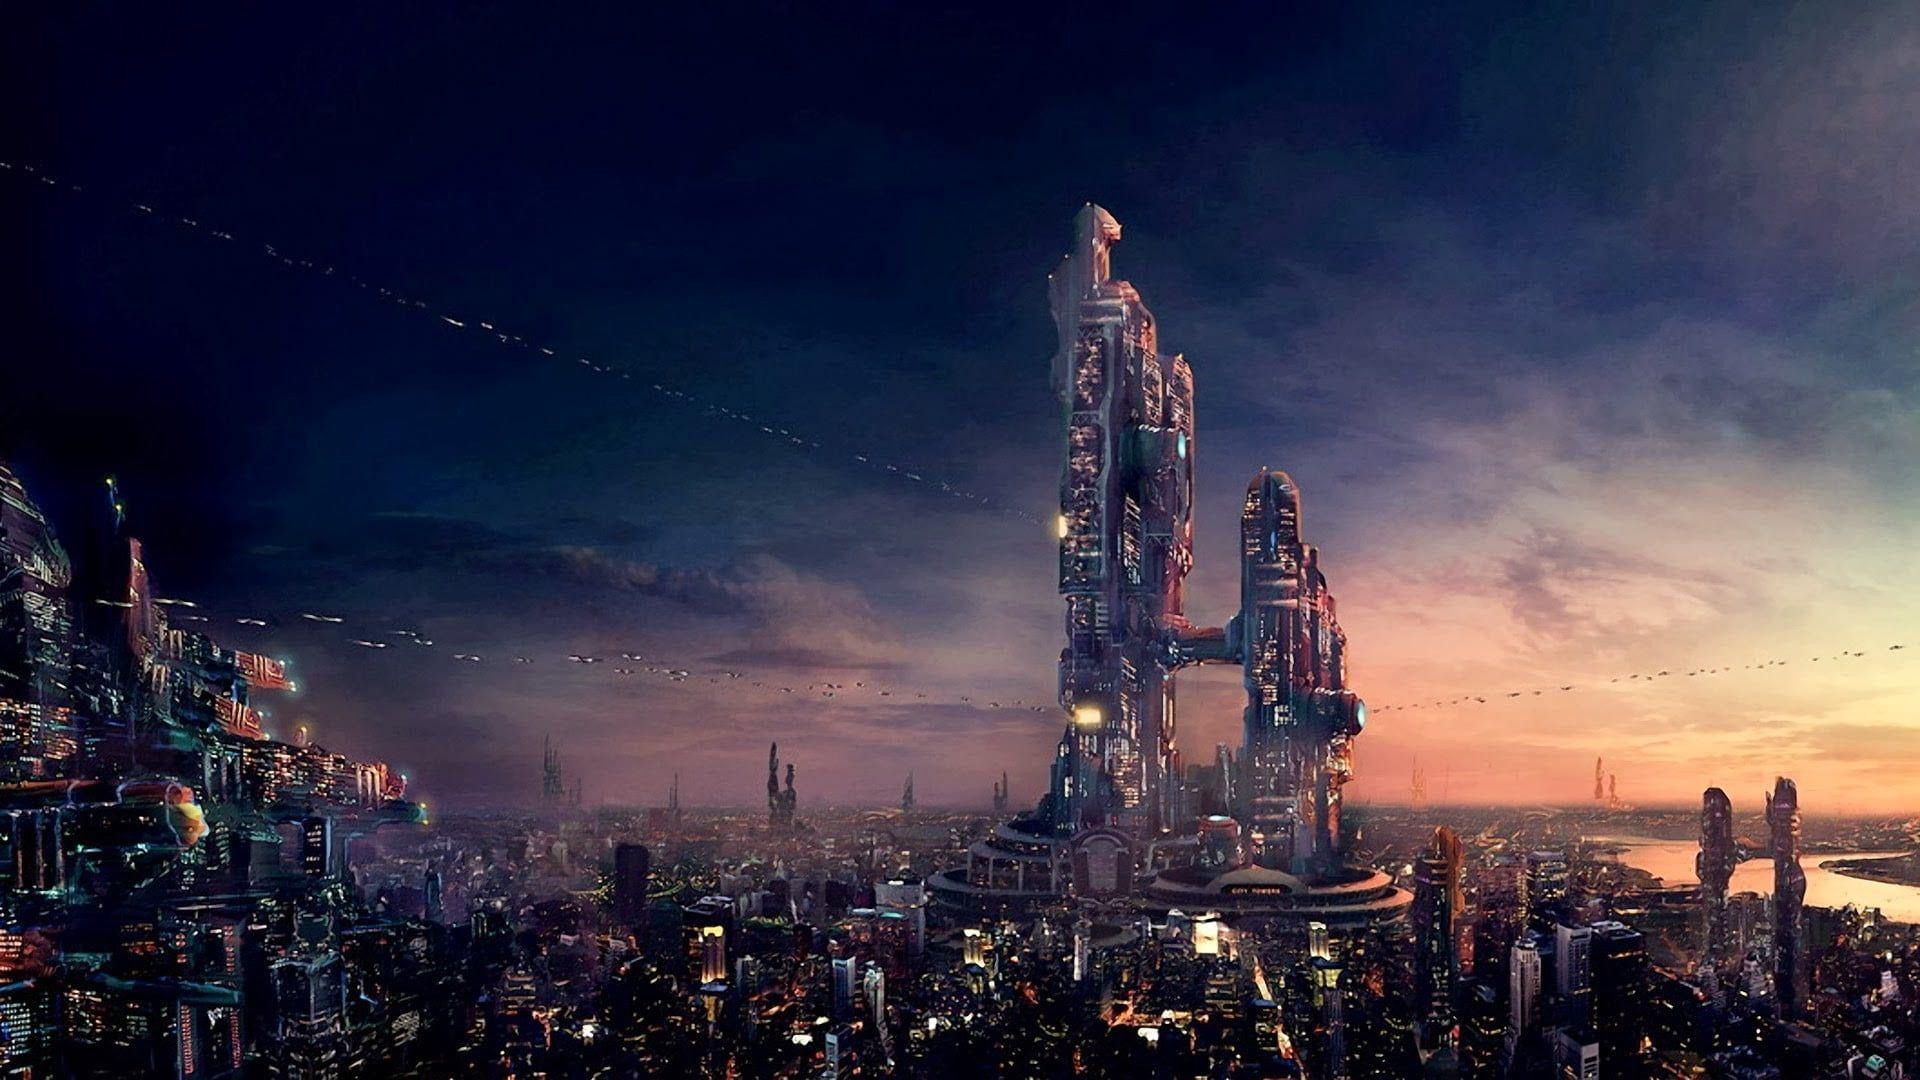 Building Digital Wallpaper Futuristic City Sky Science Fiction Artwork Cityscape Digital Art 1080p Wallpape Digital Wallpaper Futuristic City Hd Wallpaper